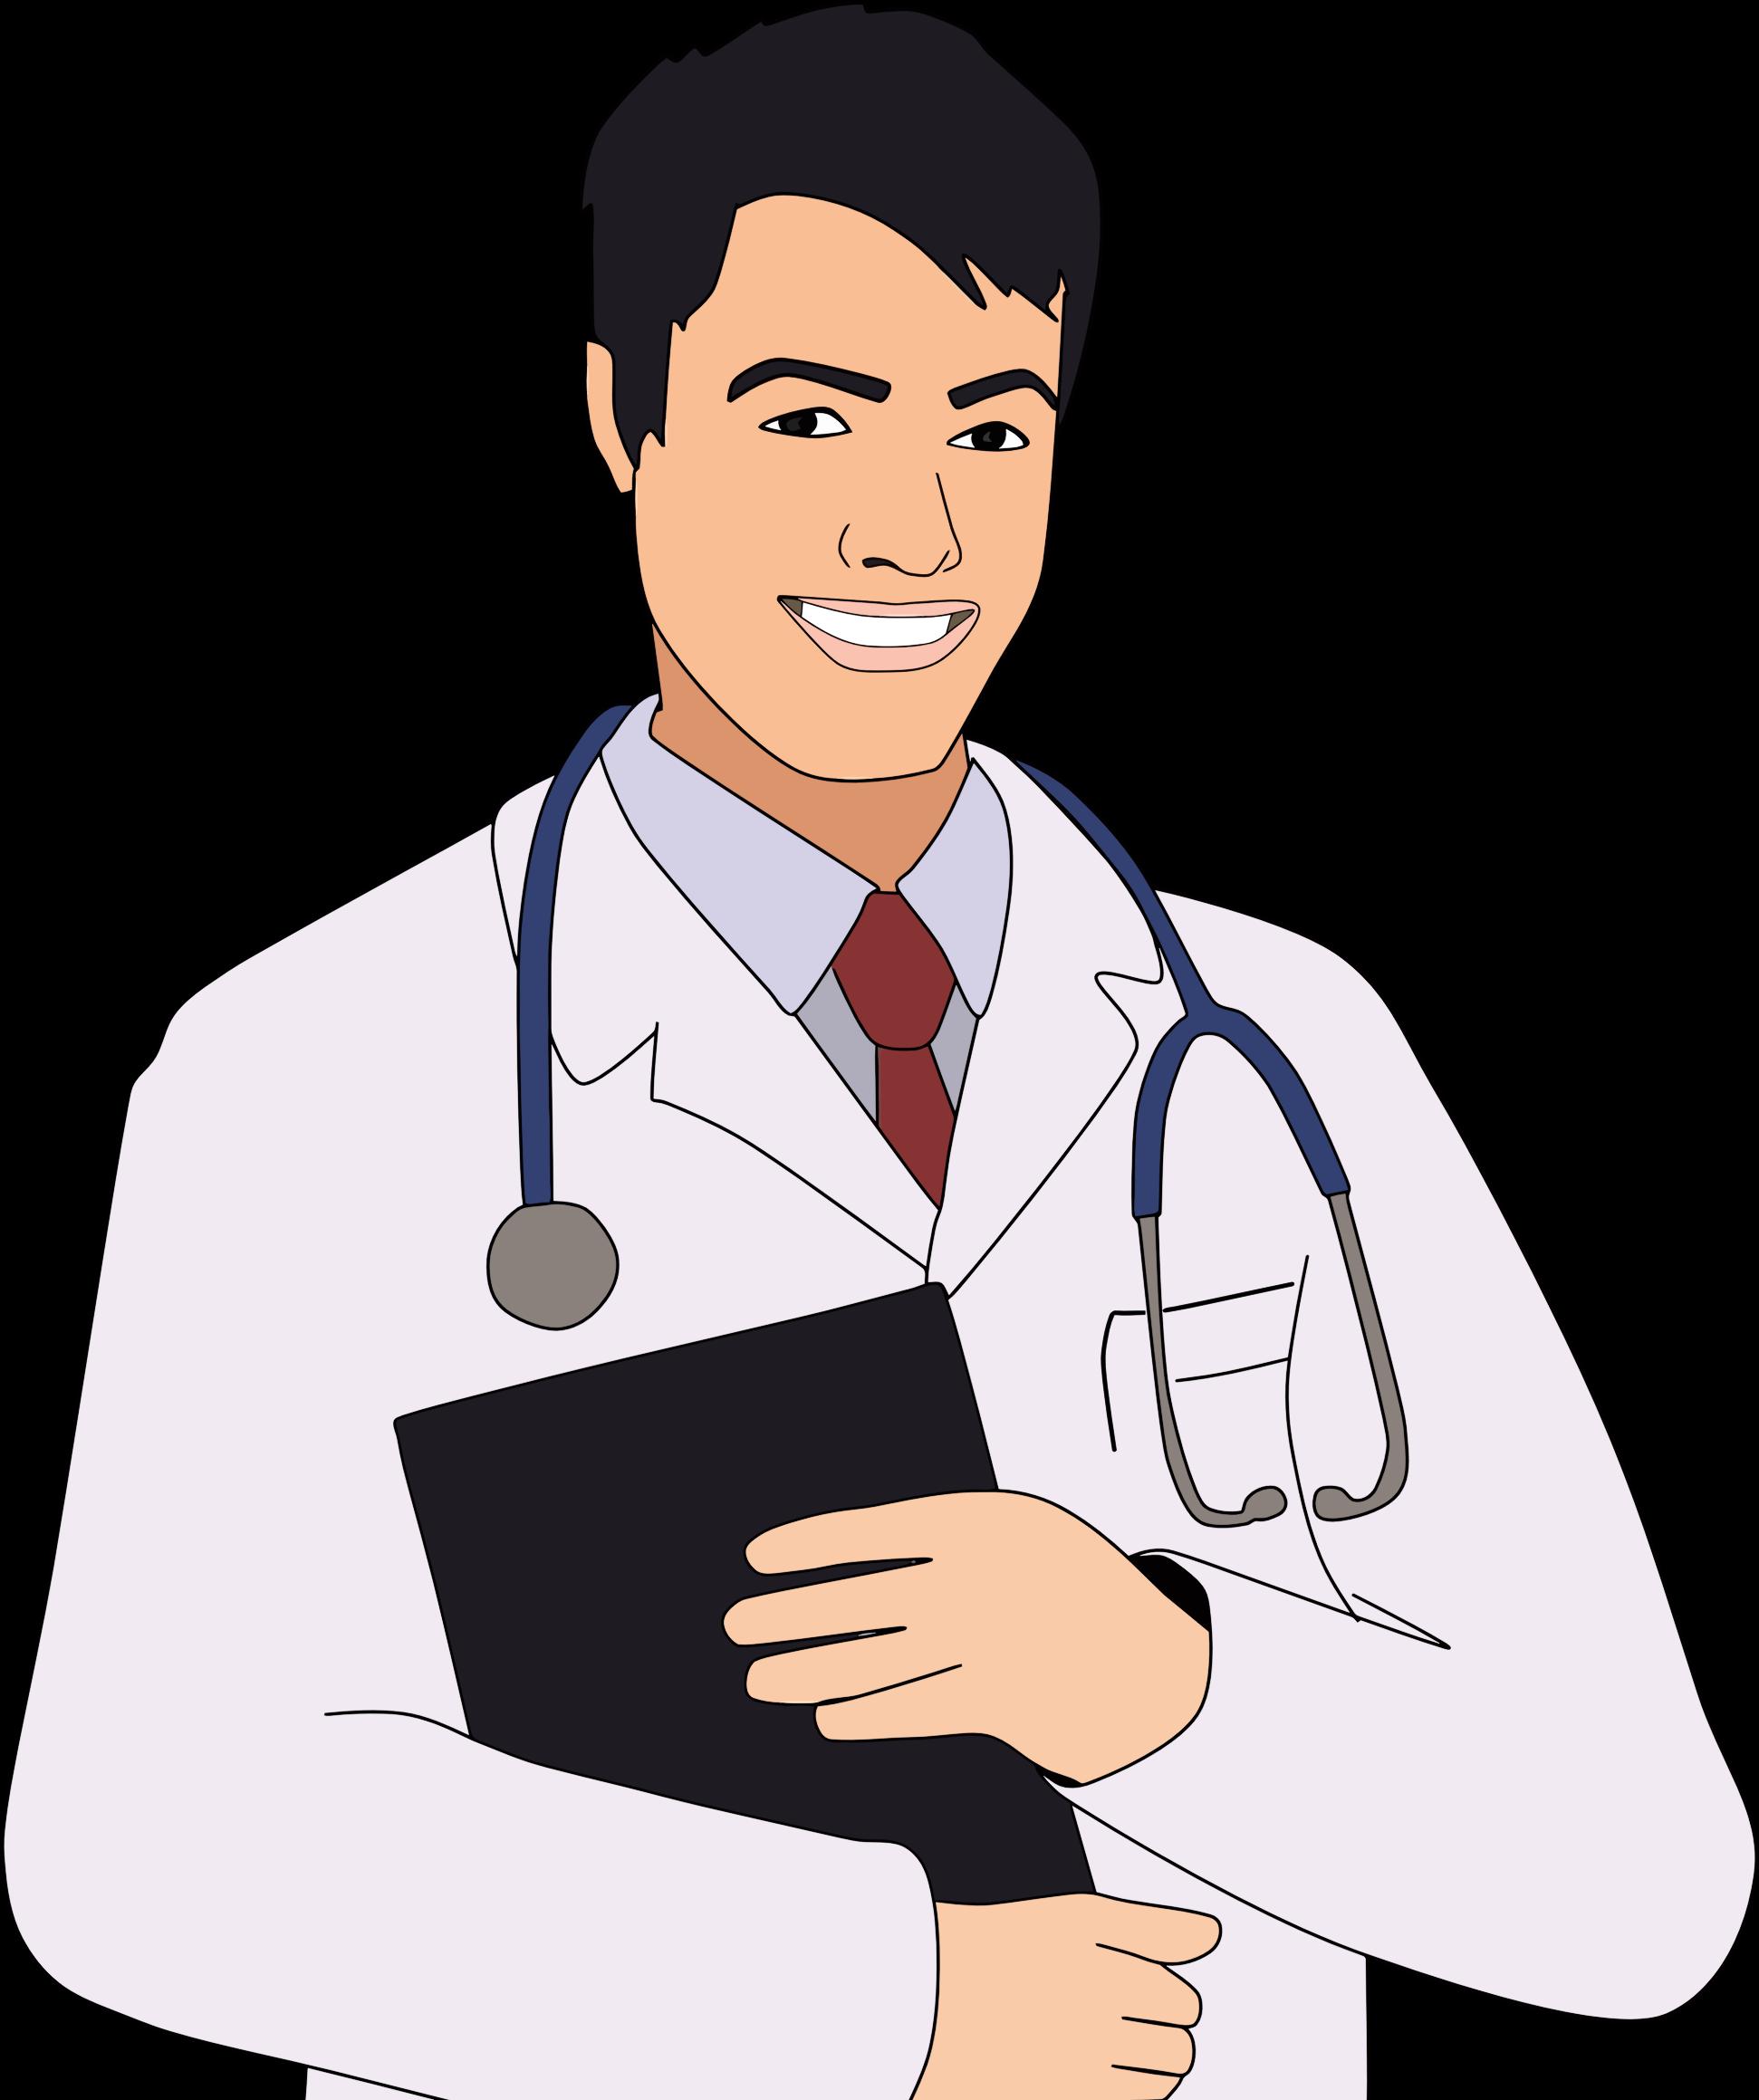 Clip art transparent cliparts. Clipart doctor physician